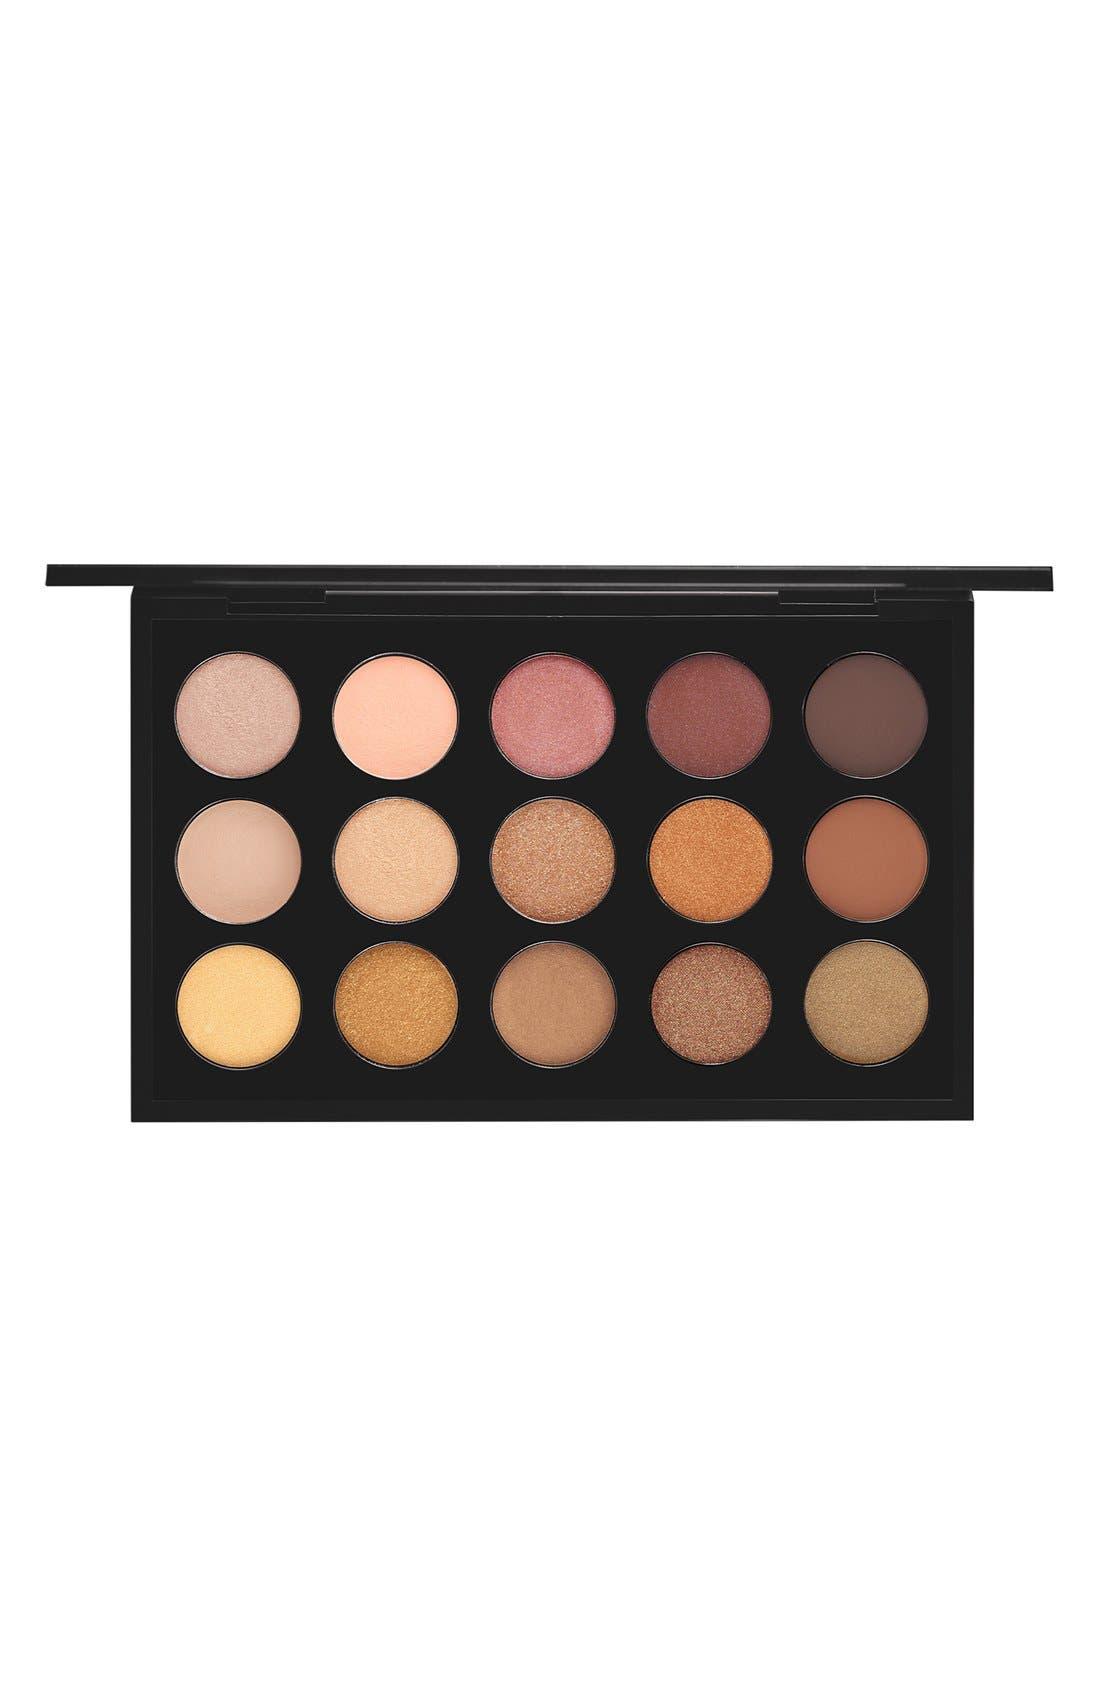 MAC Warm Neutral Times 15 Eyeshadow Palette ($101 Value)